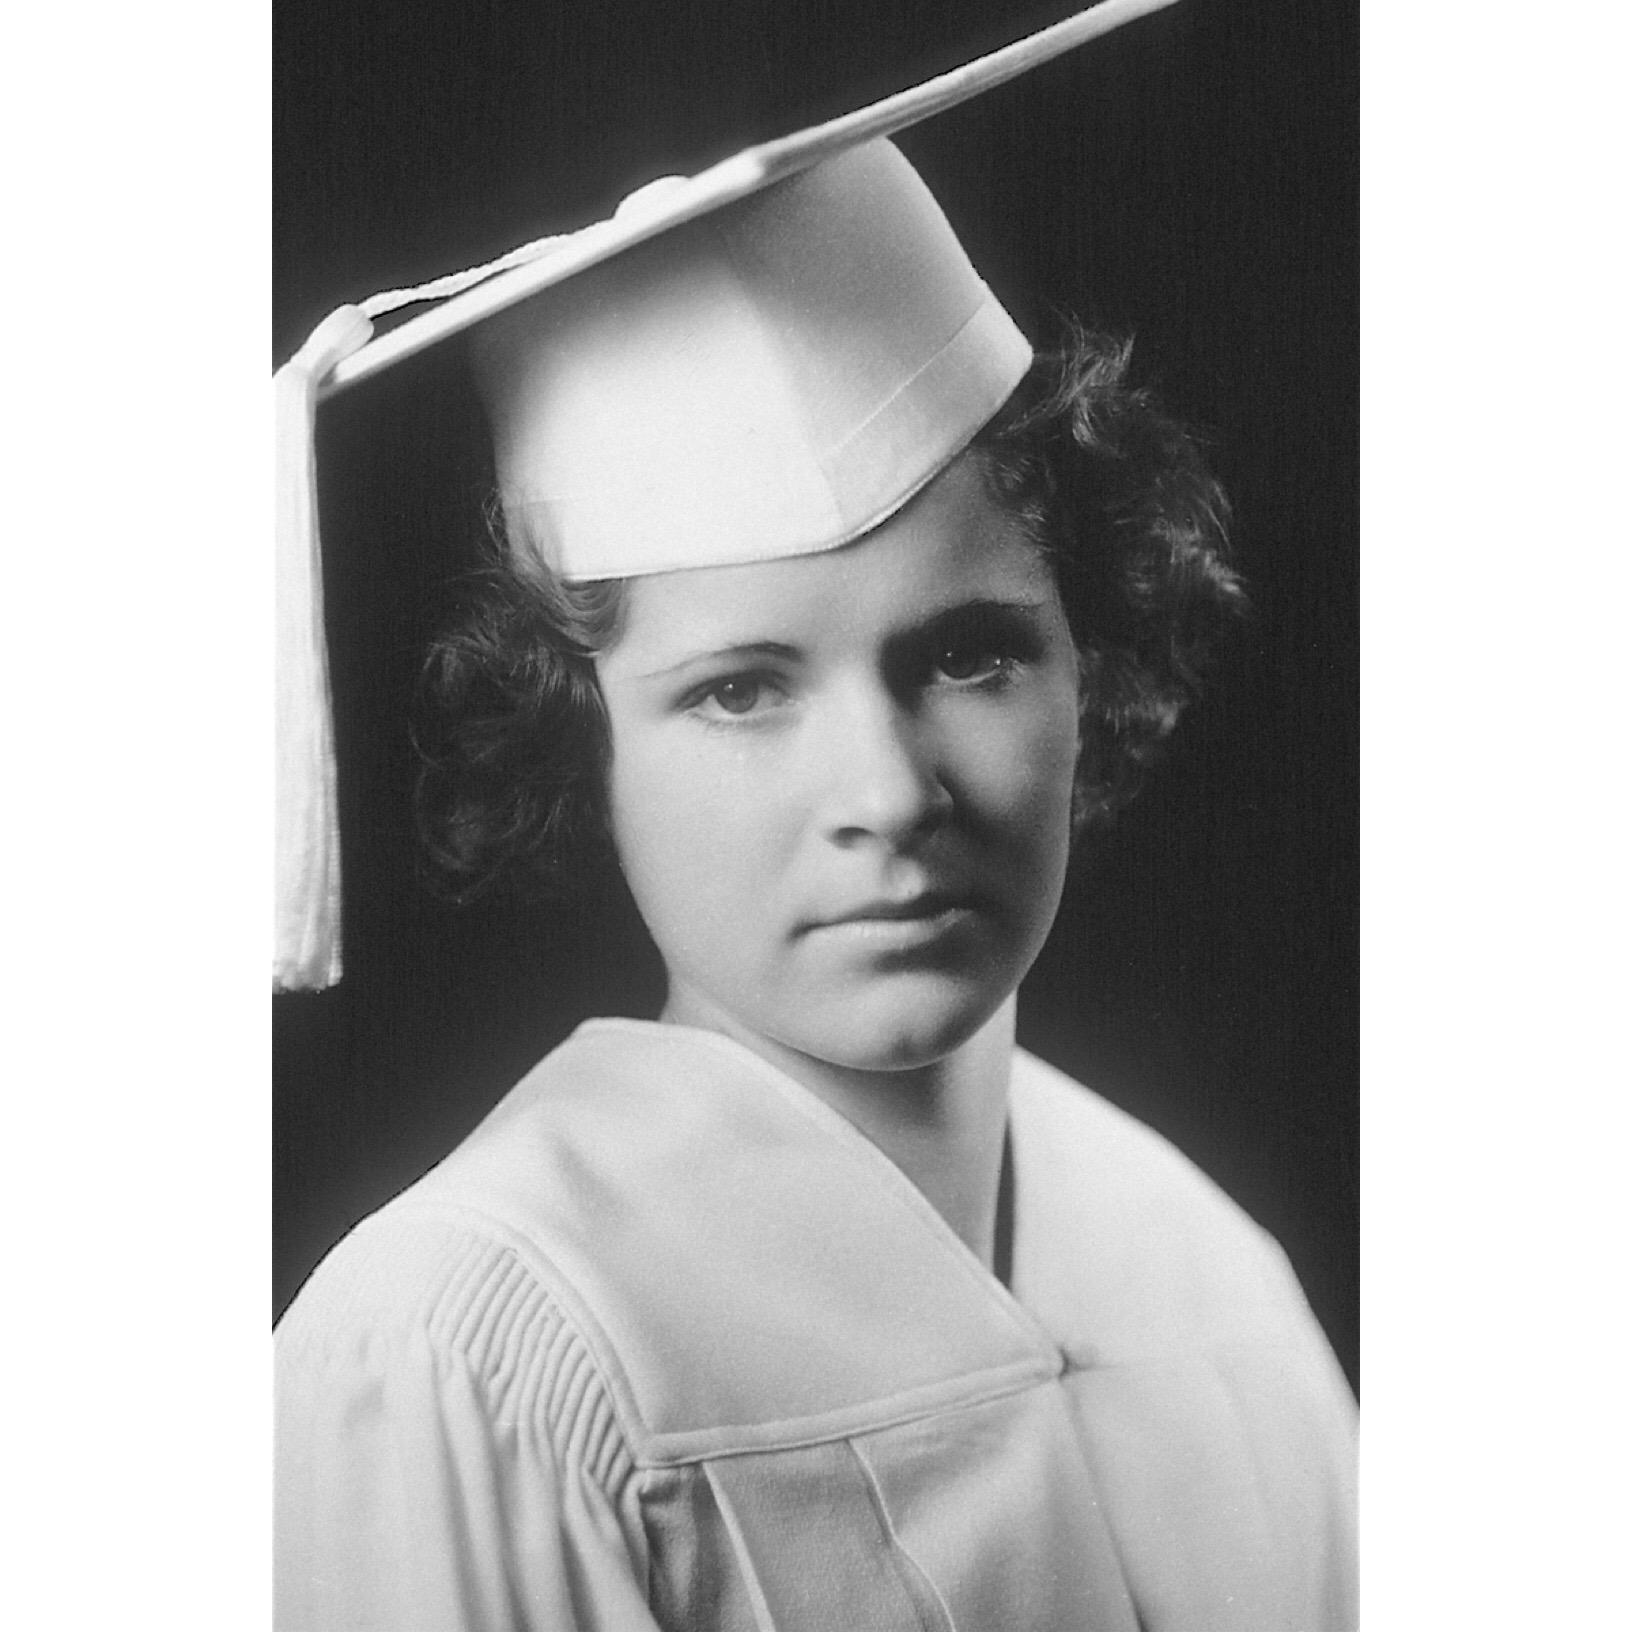 Frances Kent